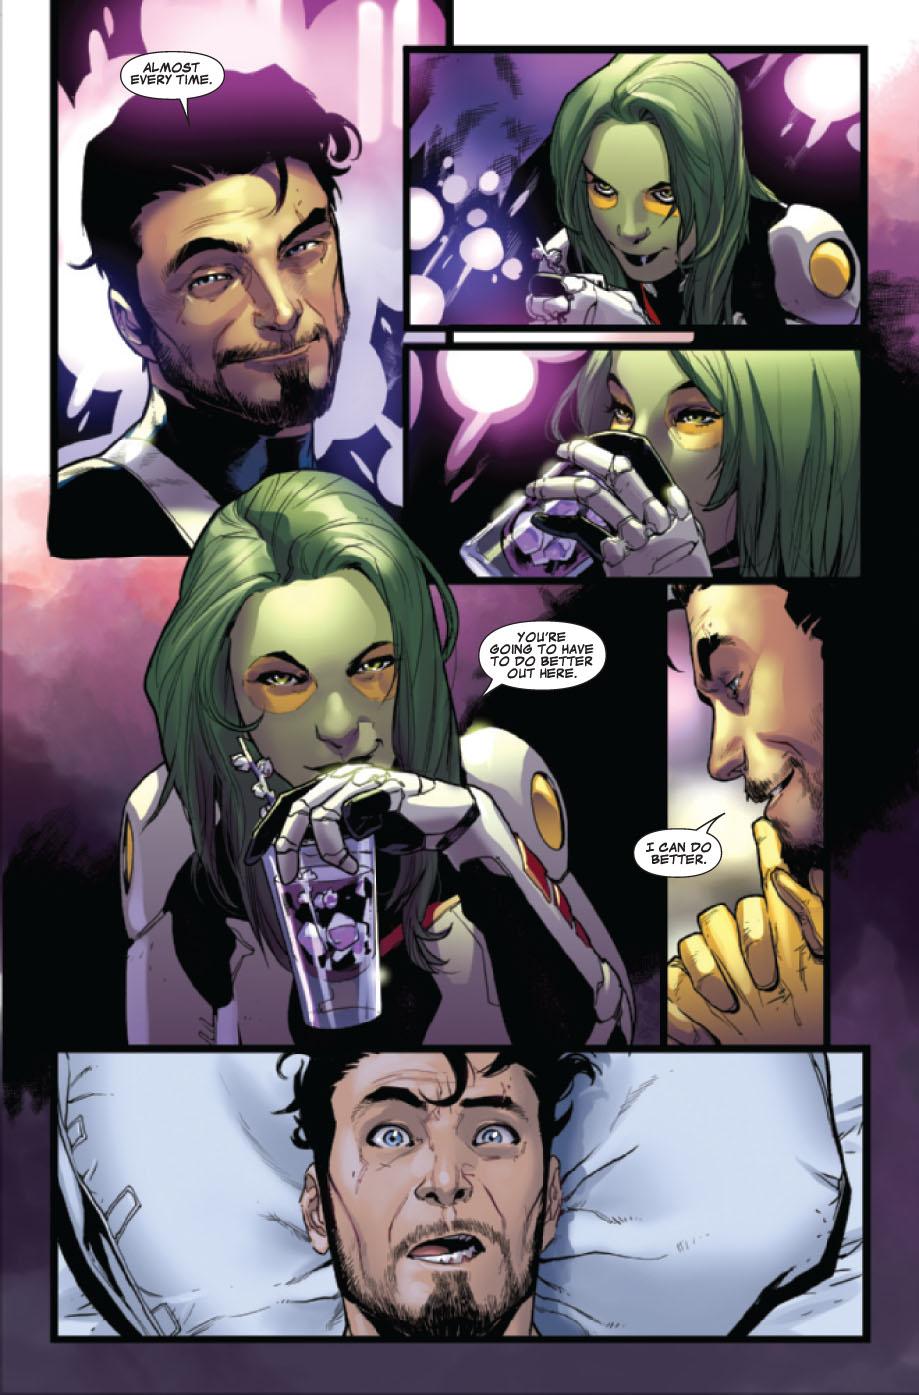 starlord and gamora relationship